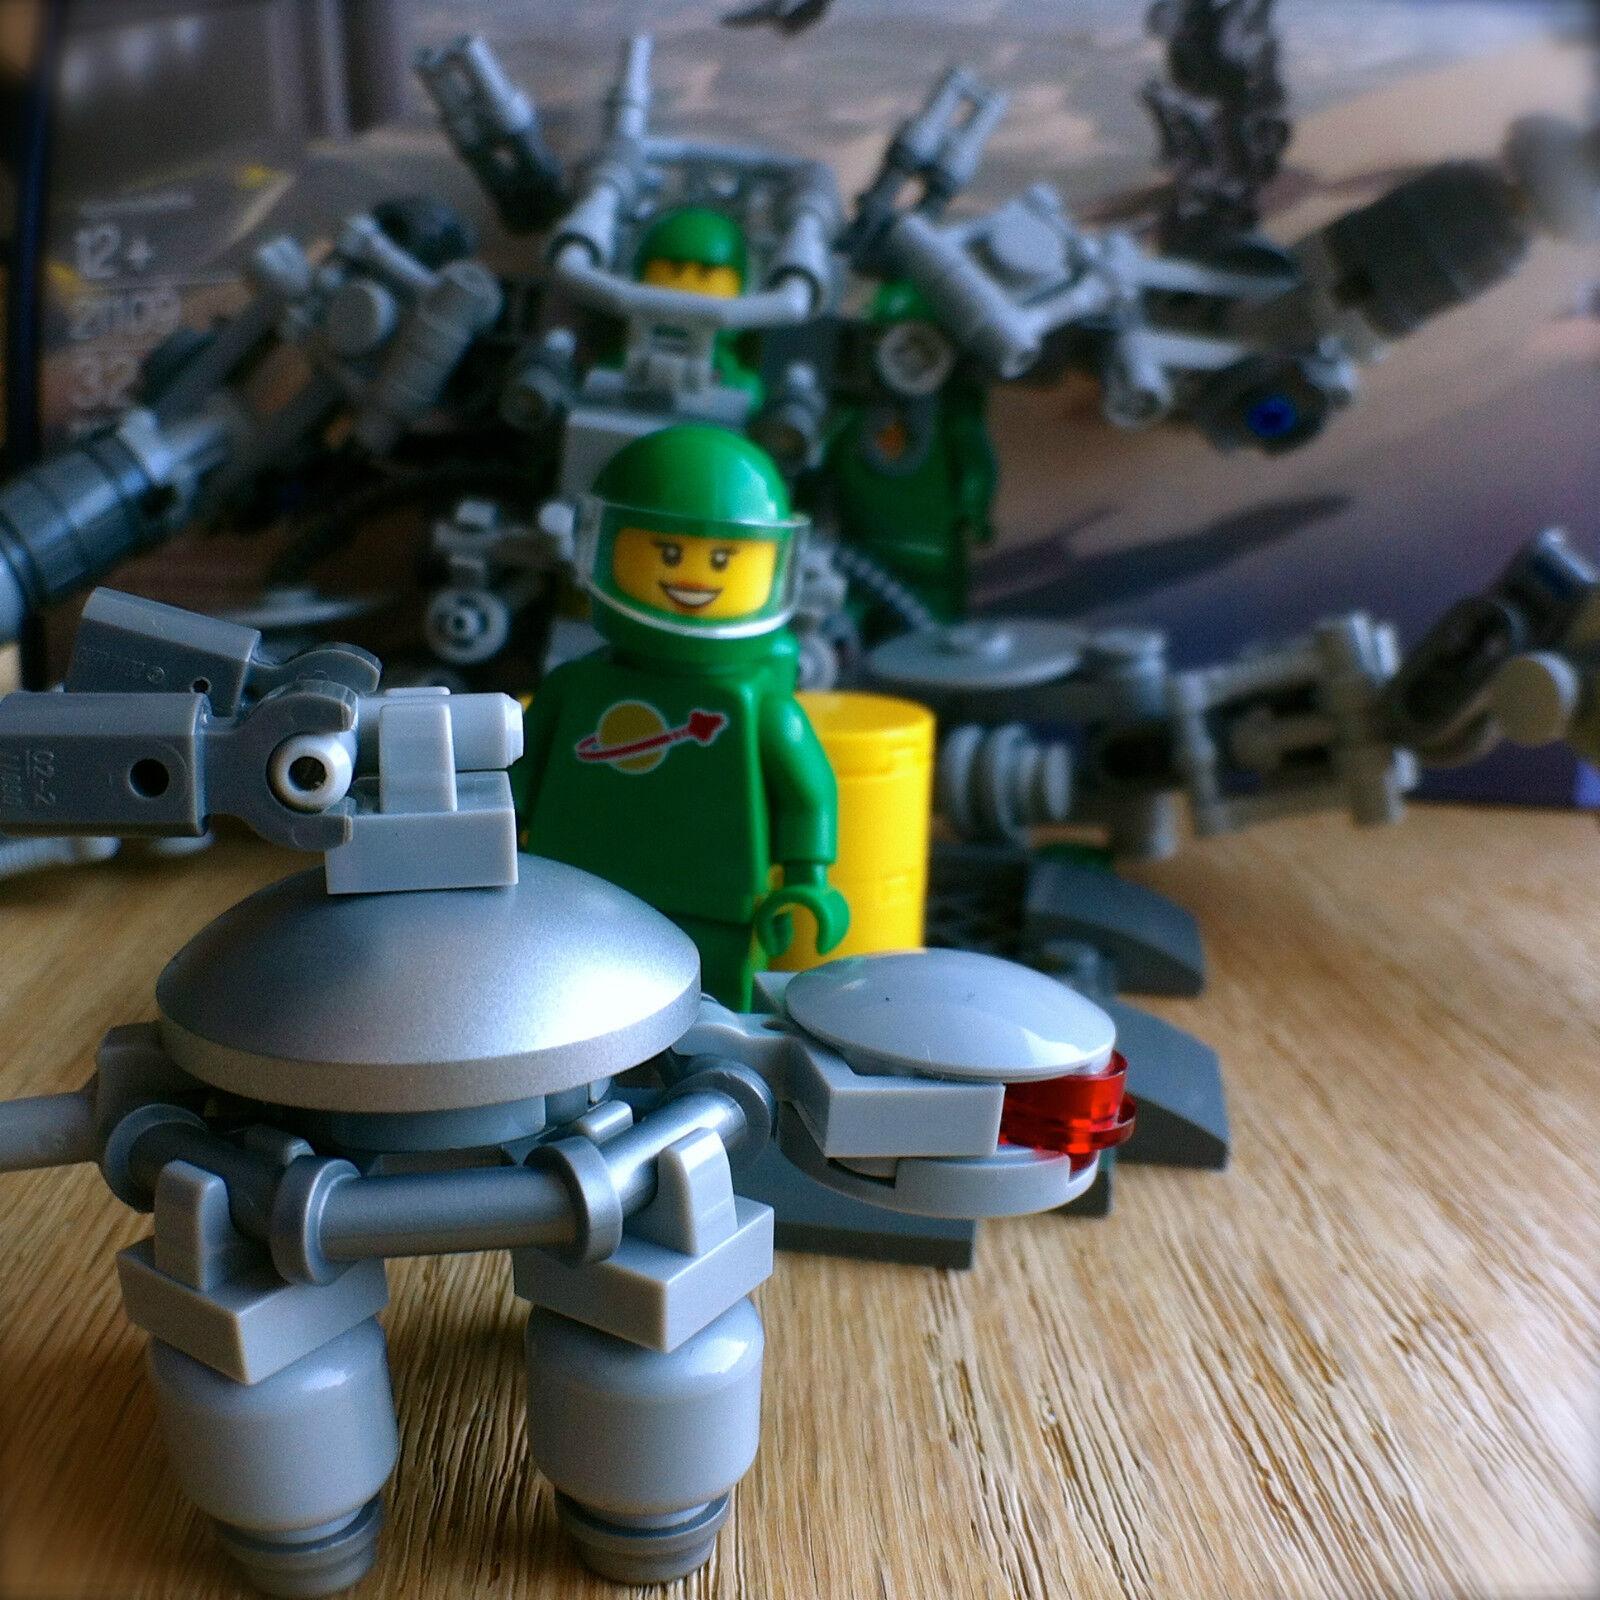 LEGO Ideas 21109 EXO SUIT 321PCS 321PCS 321PCS Pete Yve Robot Turtle Space Exosuit NEW SEALED 38521f